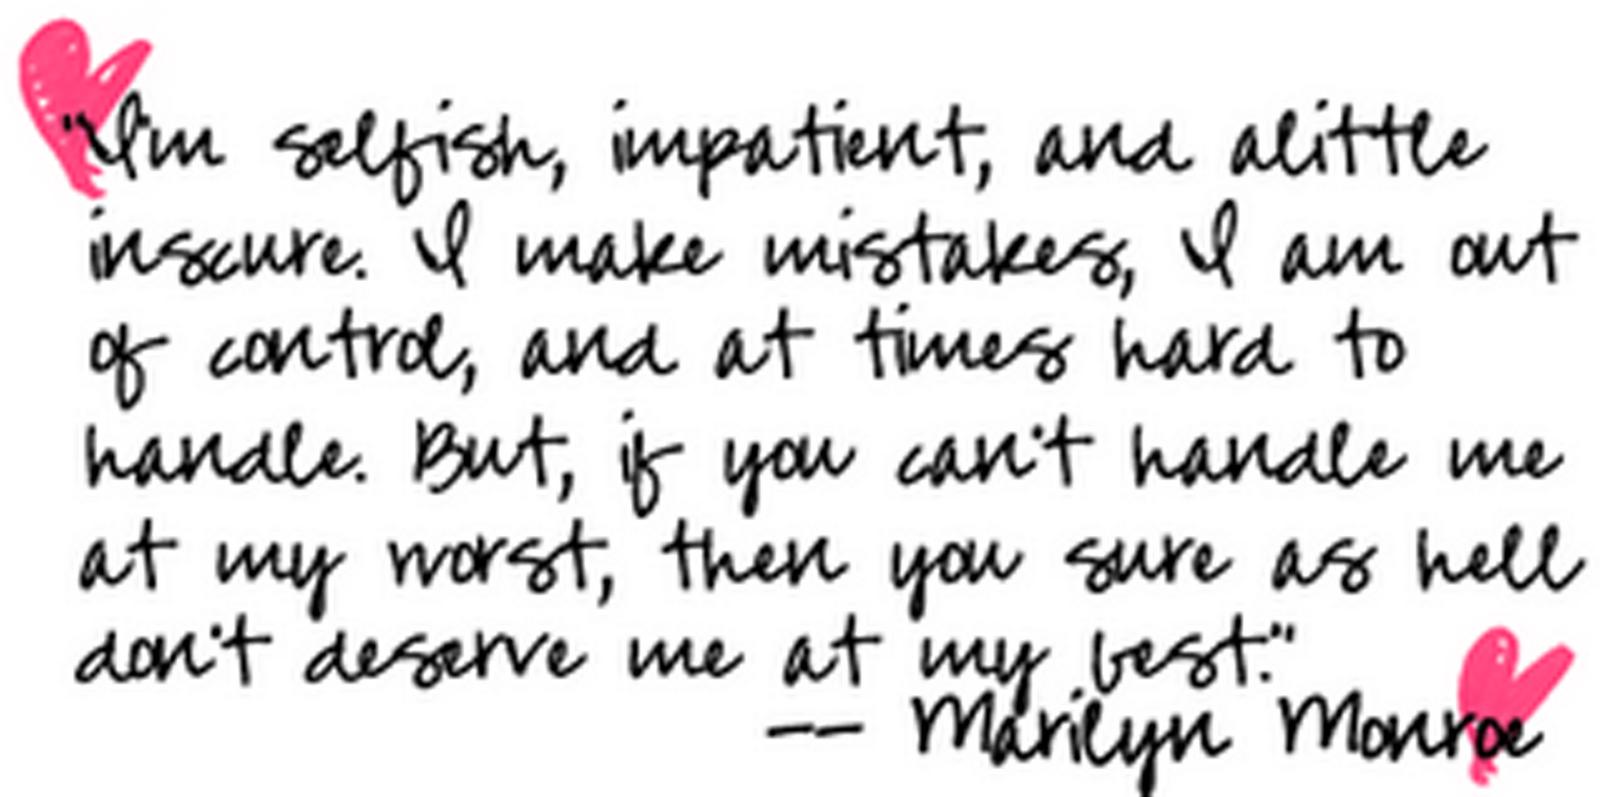 http://1.bp.blogspot.com/-mI2nf7Xw0pc/UTPtcEMkaGI/AAAAAAAAMJM/4cZNrPyscQ0/s1600/marilyn-monroe-quotes-women-ladies-girls-inspirations-inspire+(5).png